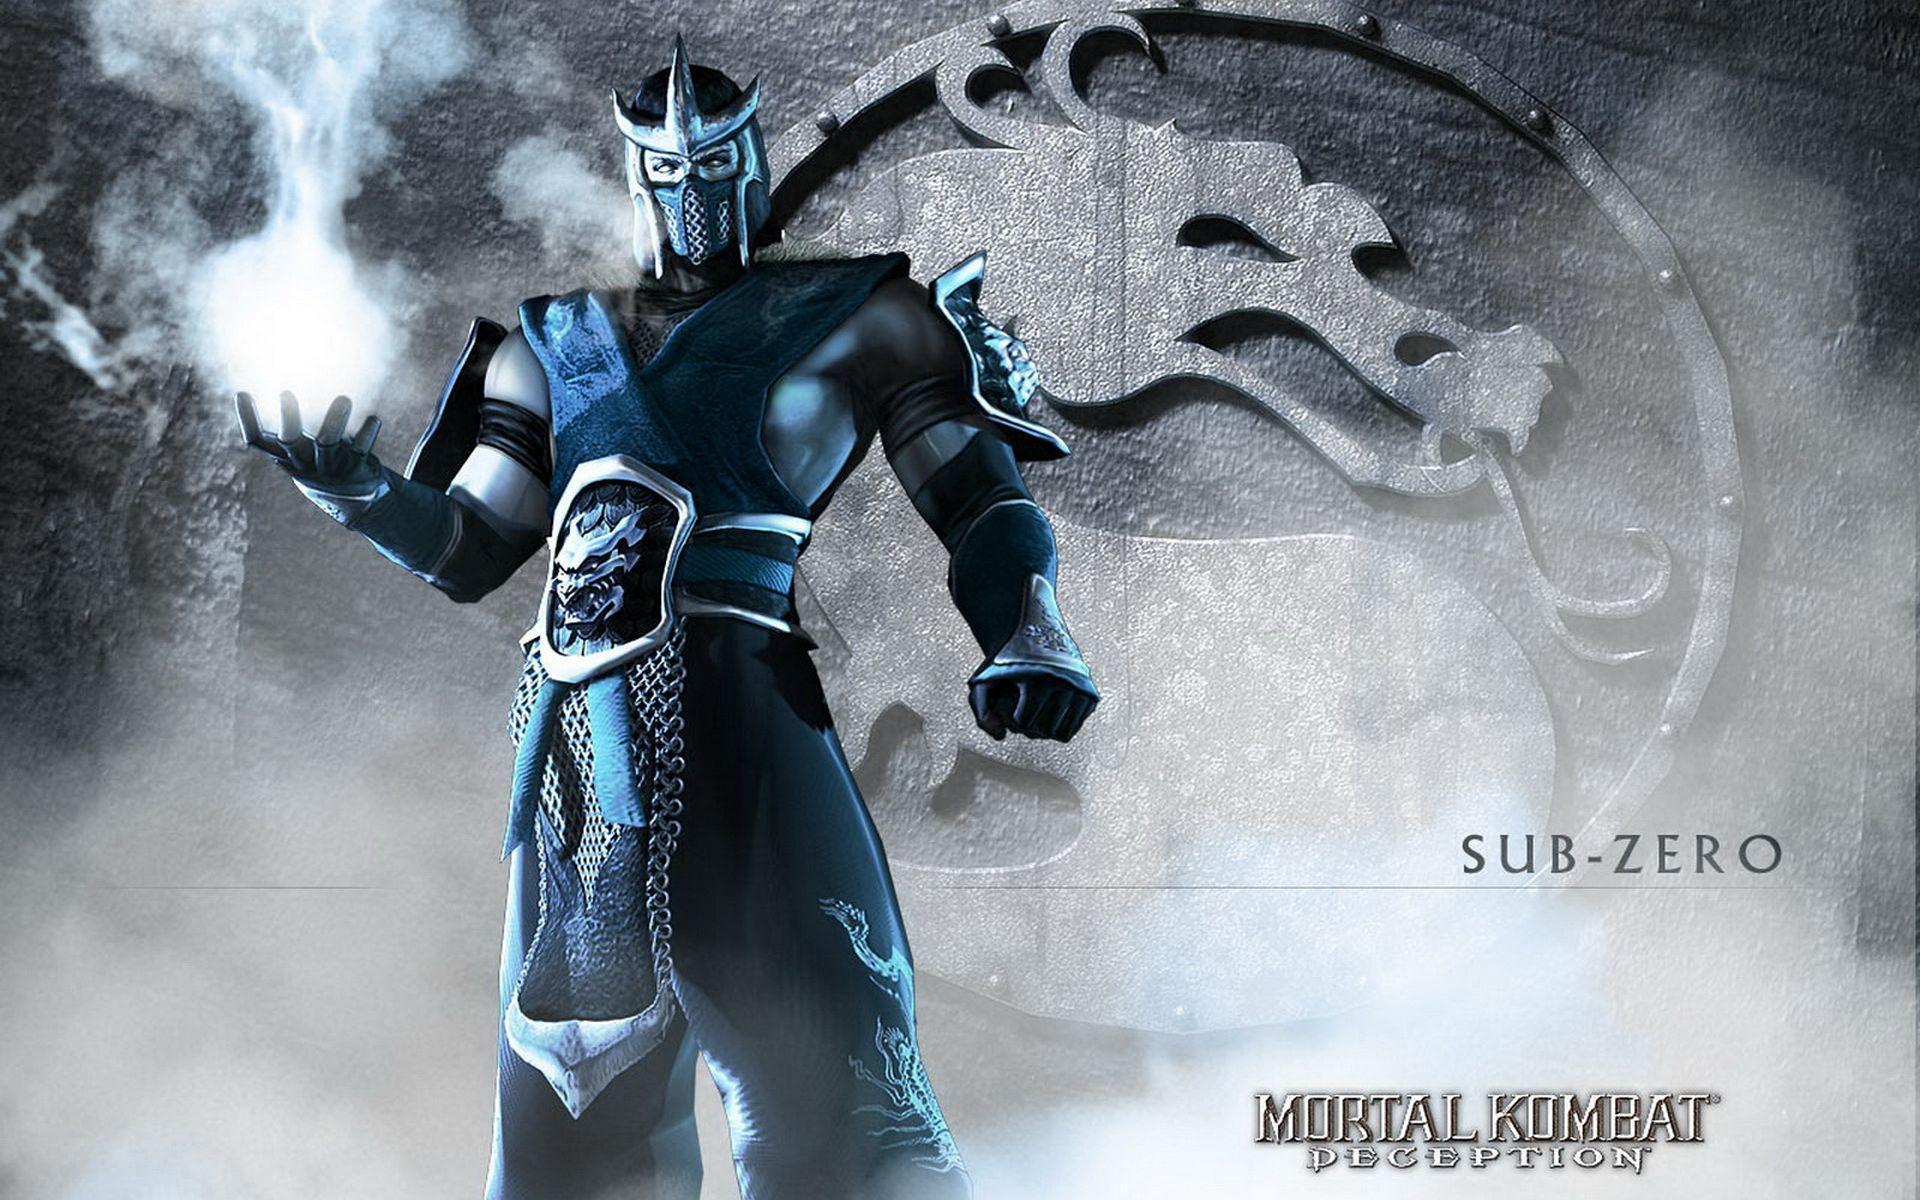 Mortal Kombat Raiden Wallpapers - Top Free Mortal Kombat